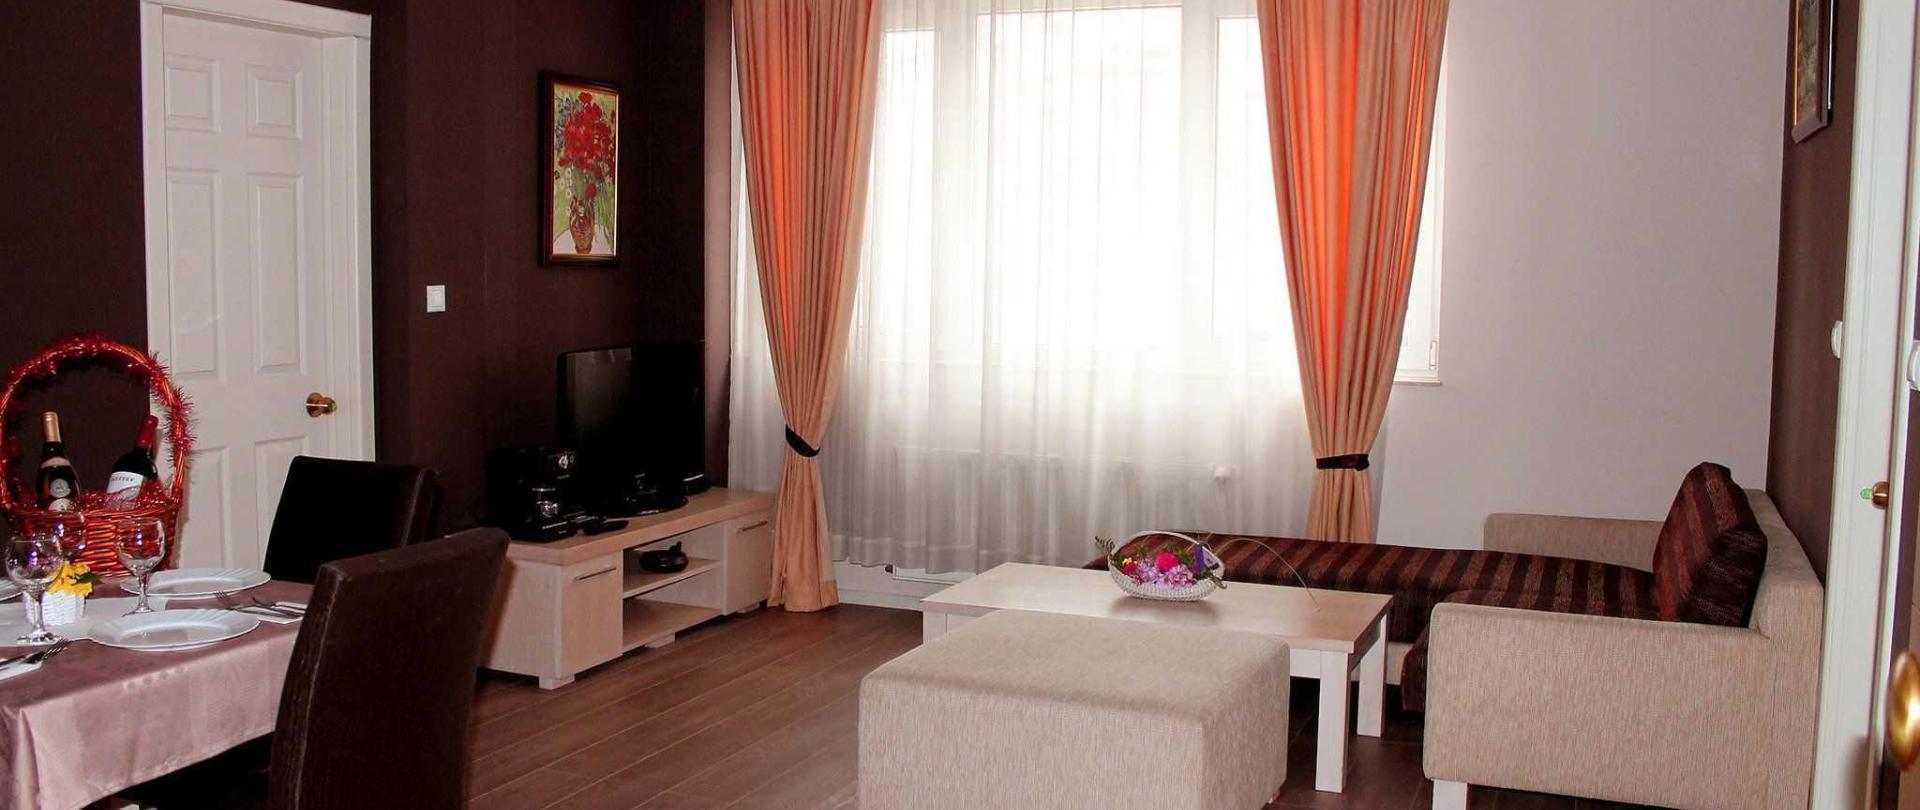 1-livingroom-a.jpg